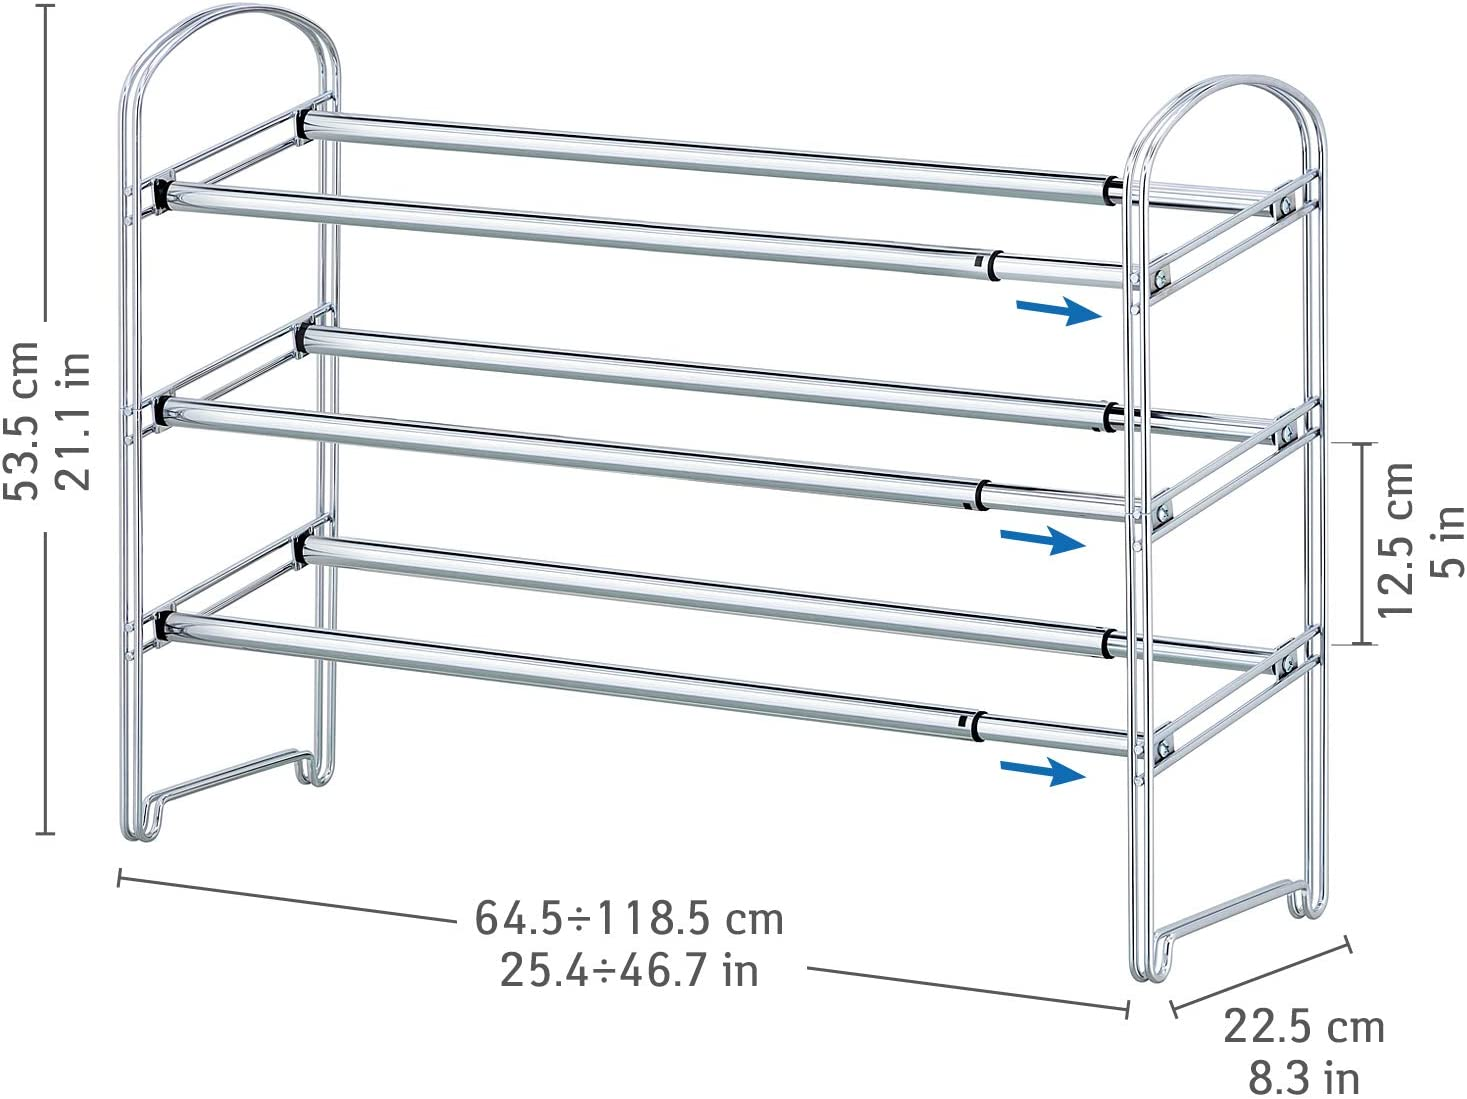 Dimensiones del zapatero extensible de acero inoxidable Tatkraft